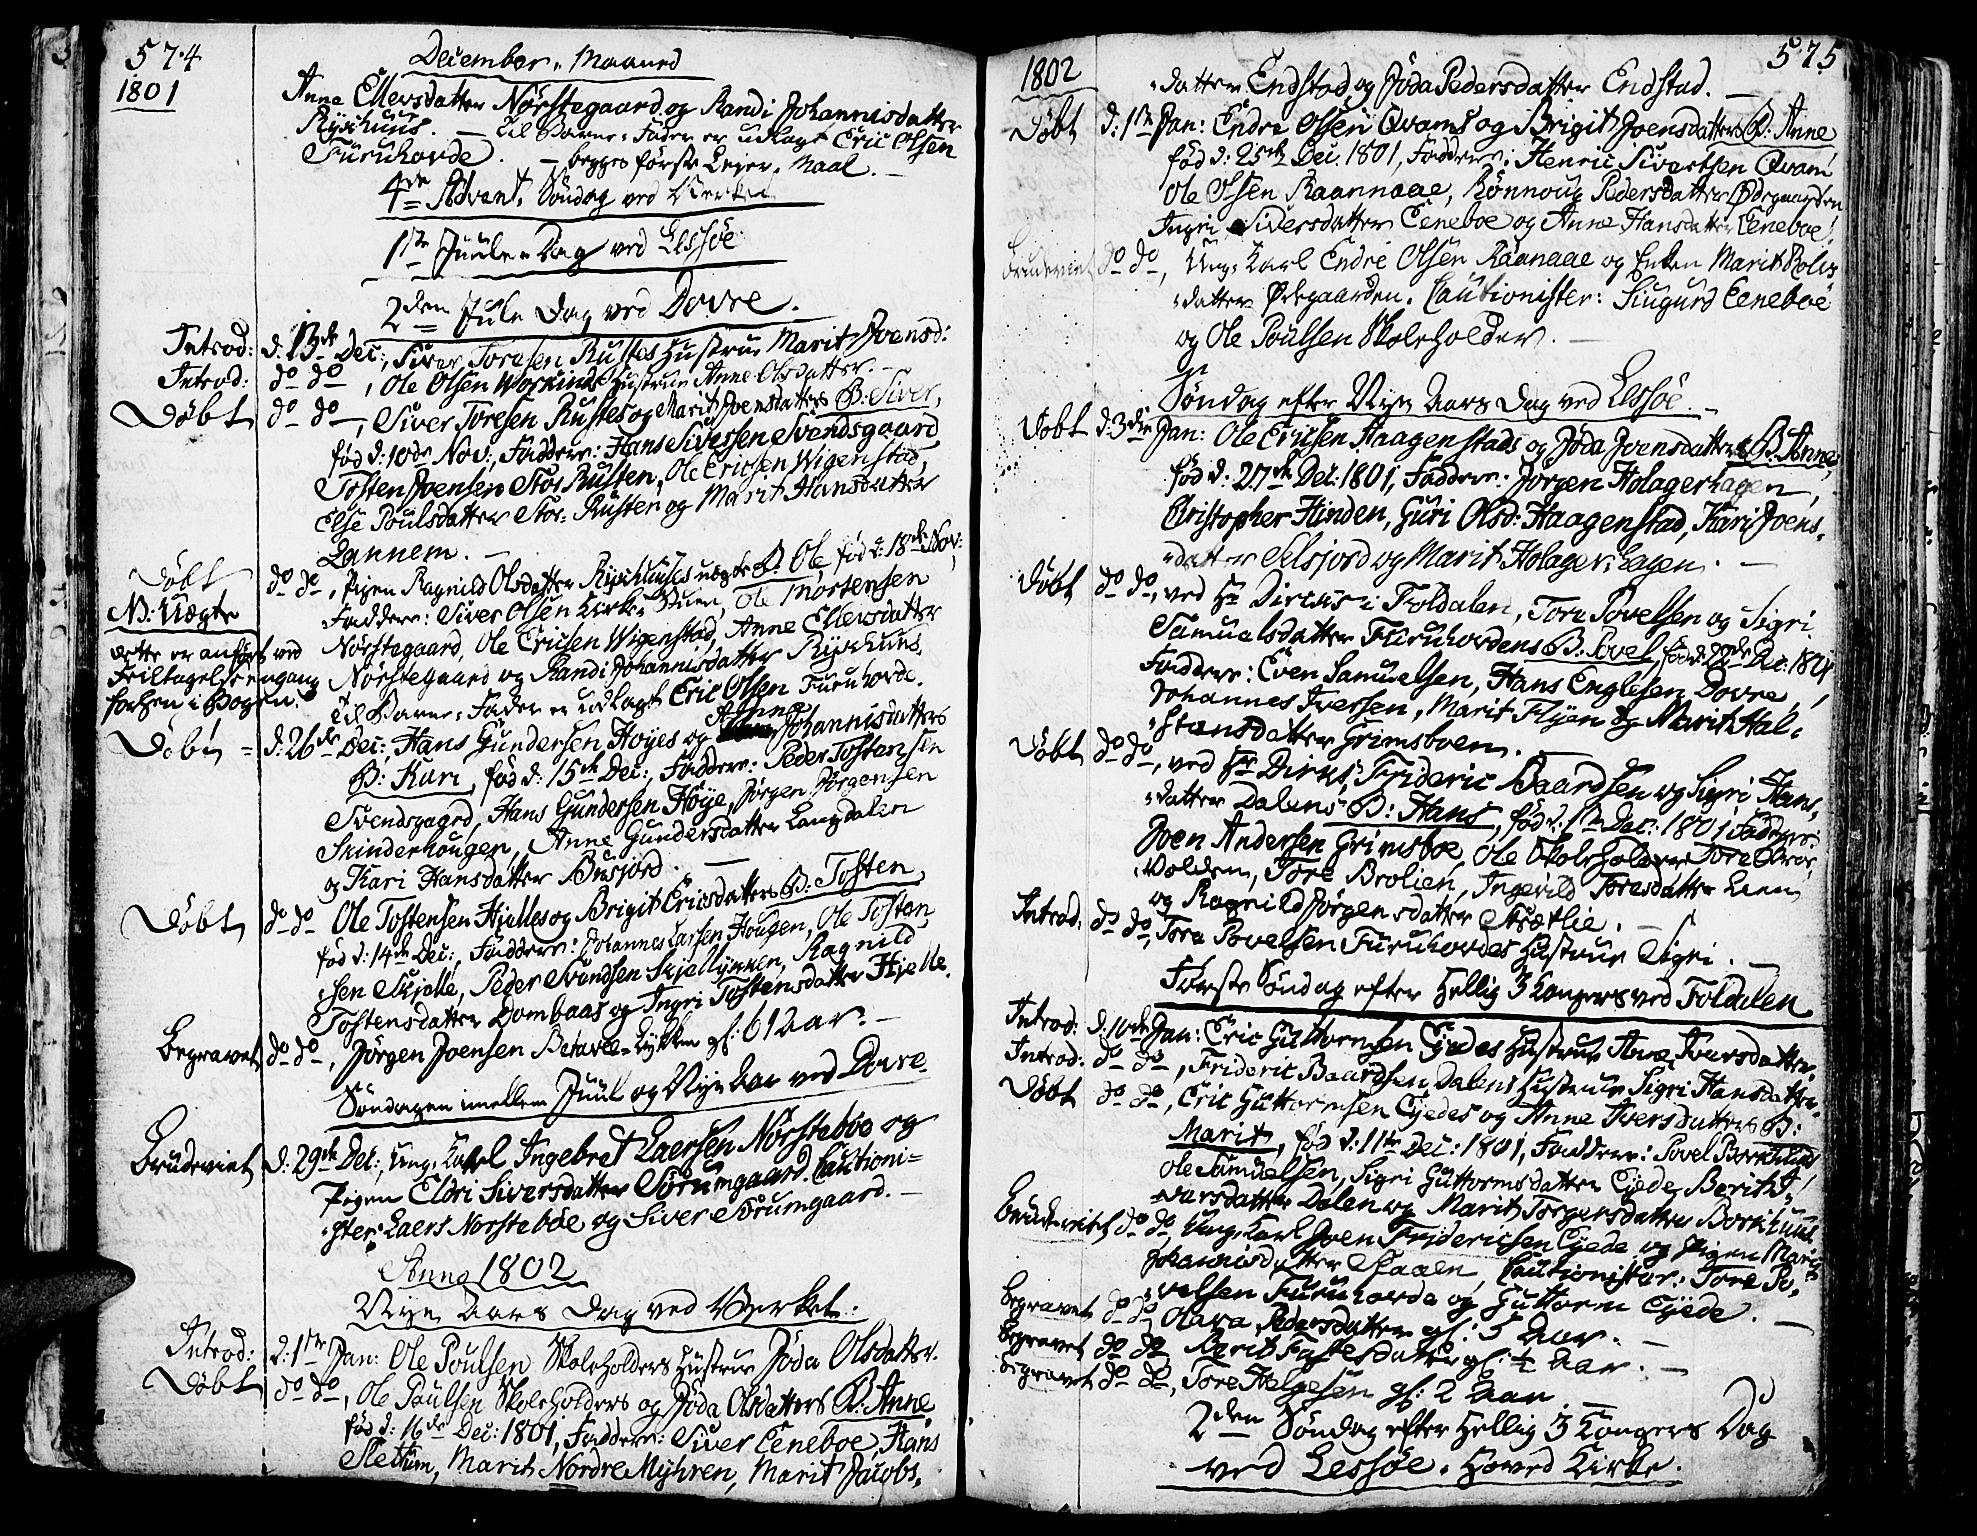 SAH, Lesja prestekontor, Ministerialbok nr. 3, 1777-1819, s. 574-575